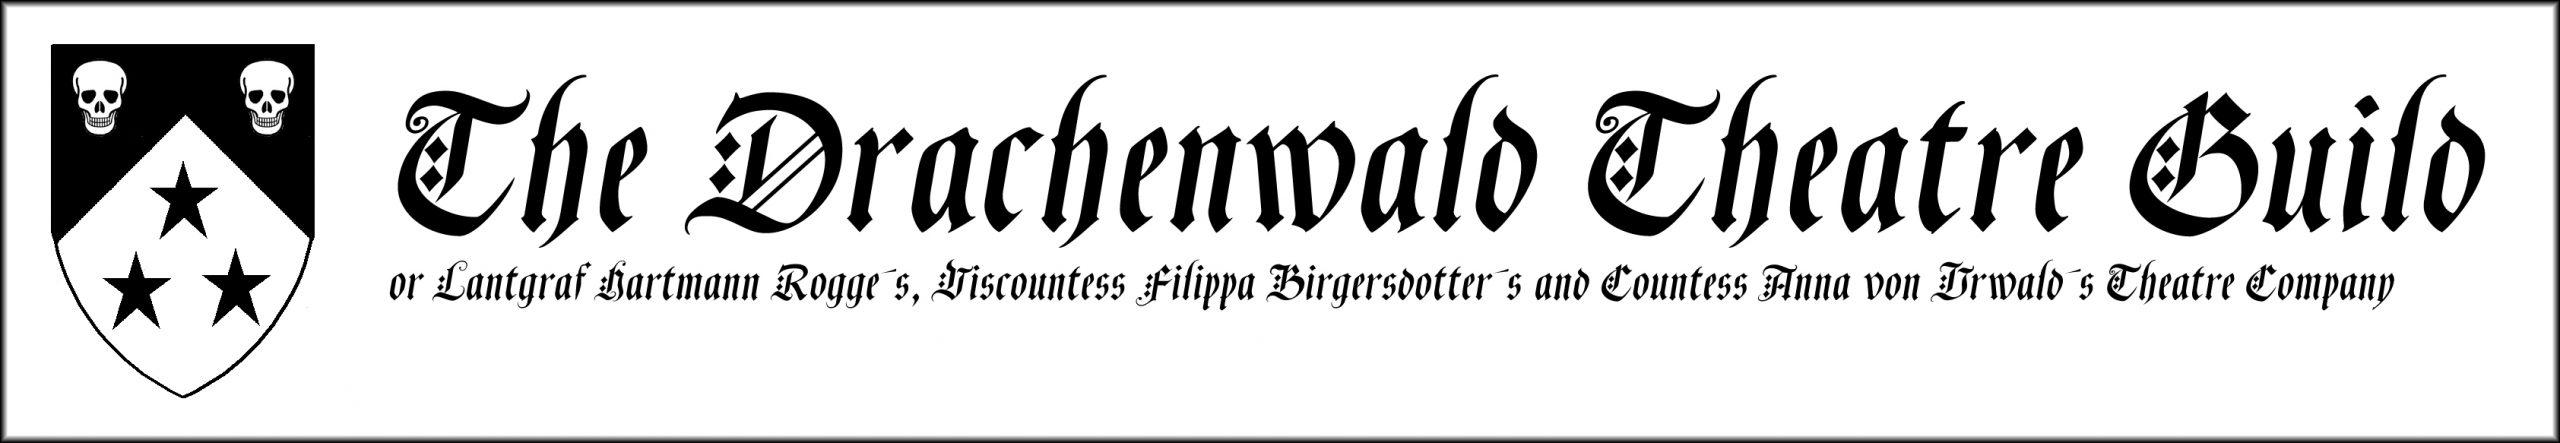 The Drachenwald Theatre Guild